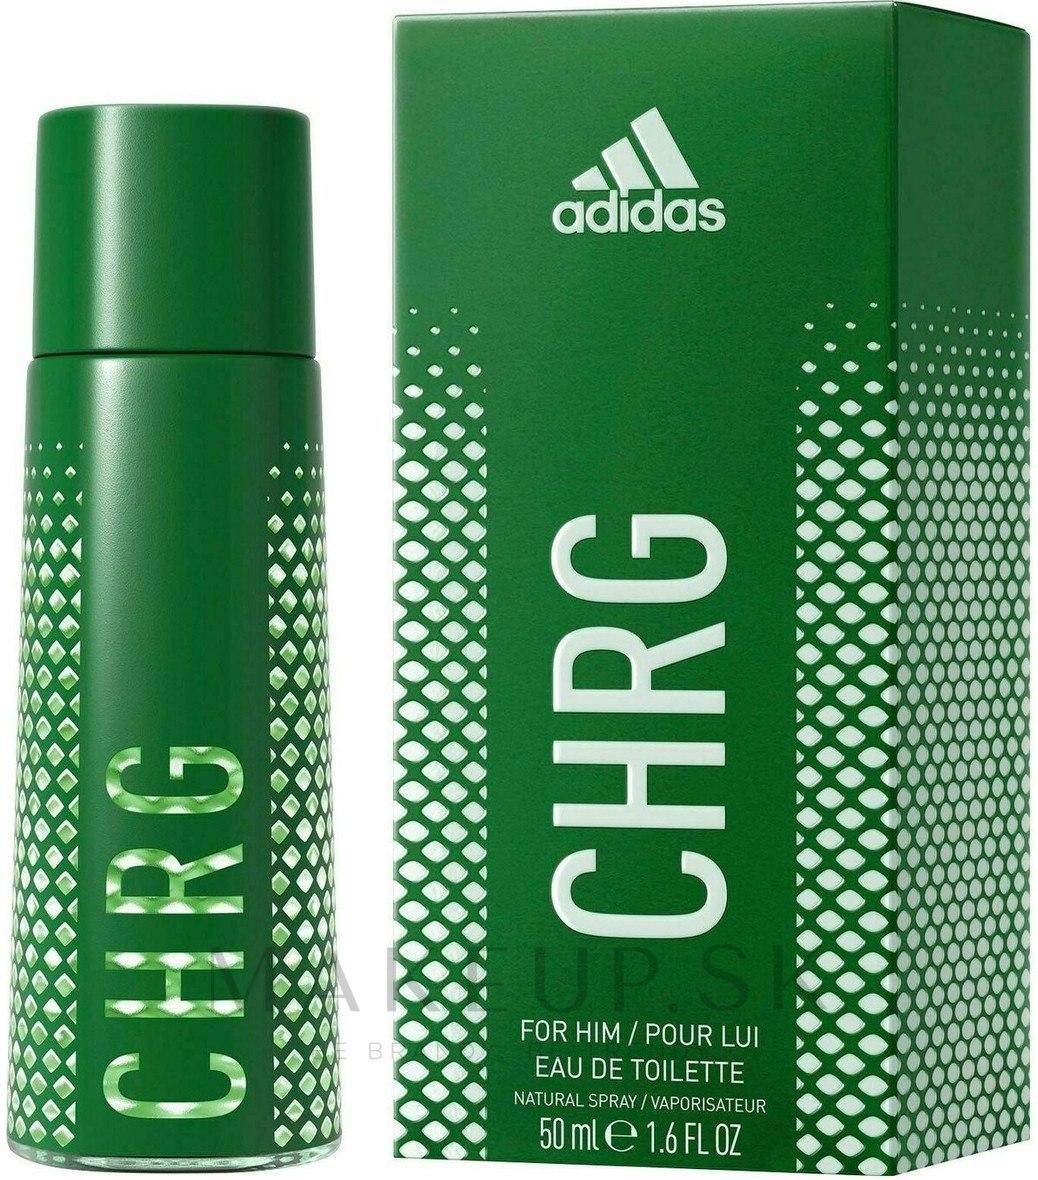 Adidas CHRG, edt 50ml